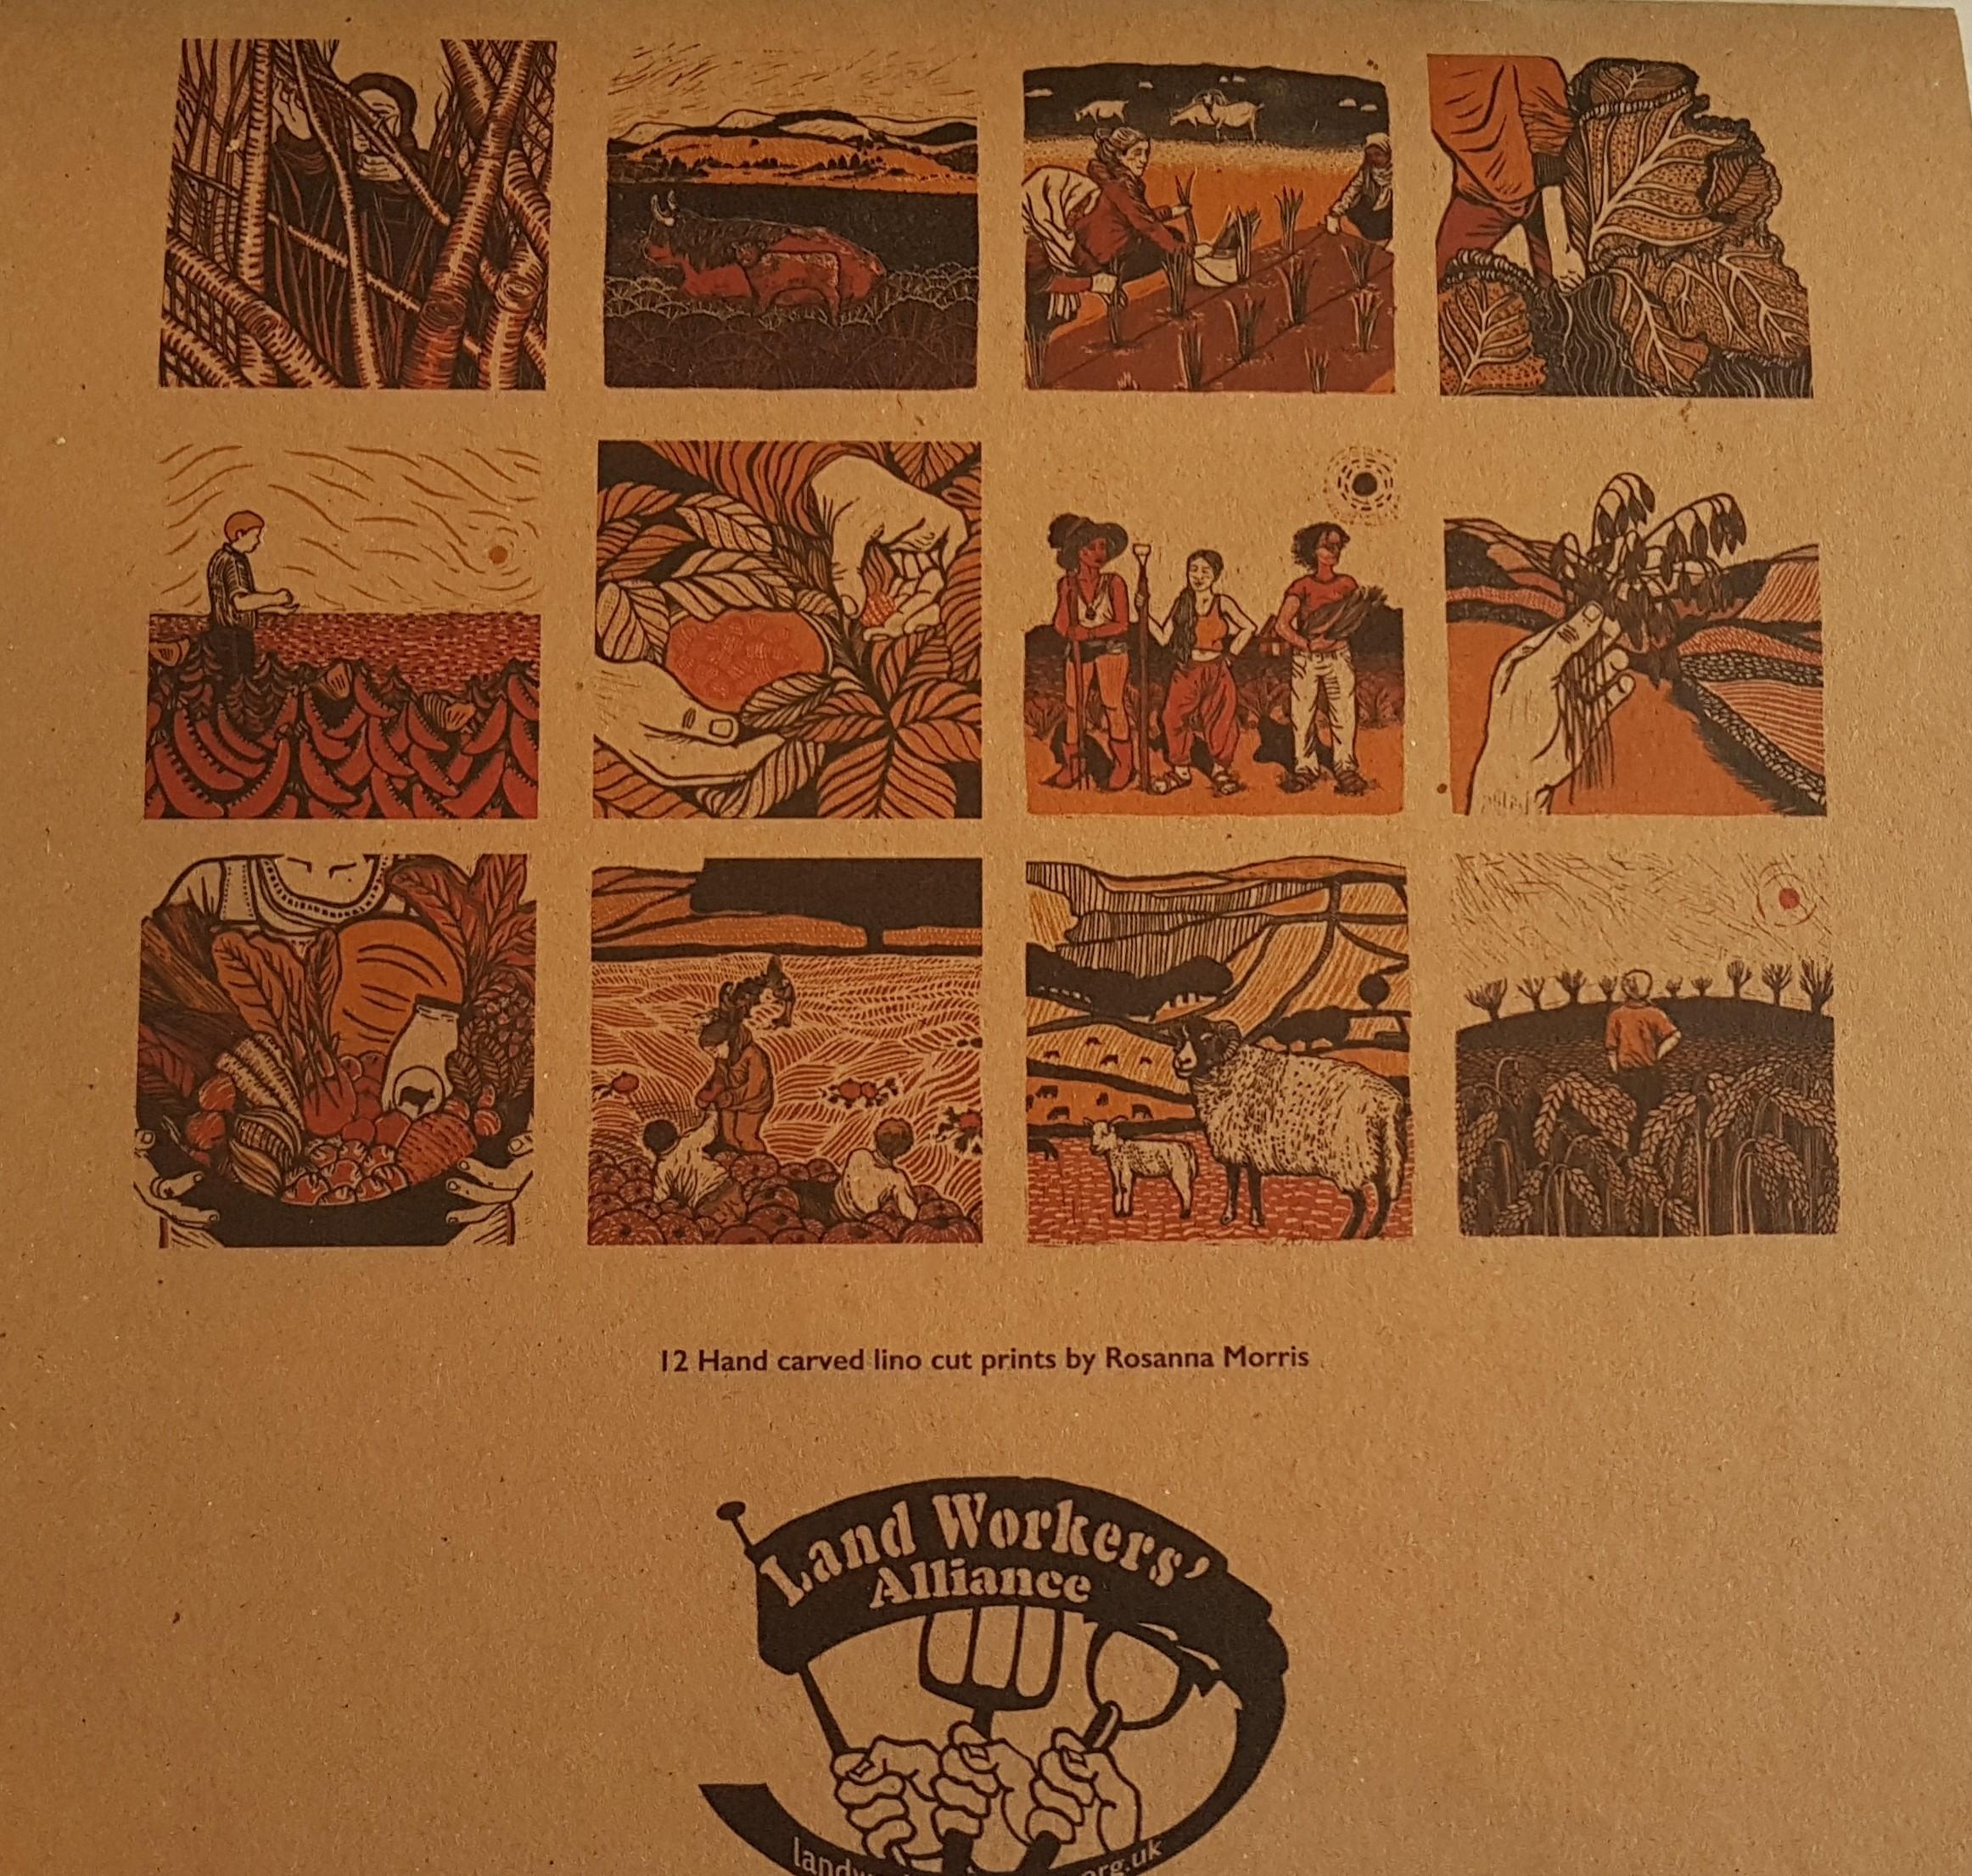 The Landworkers' Alliance Calendar 2021